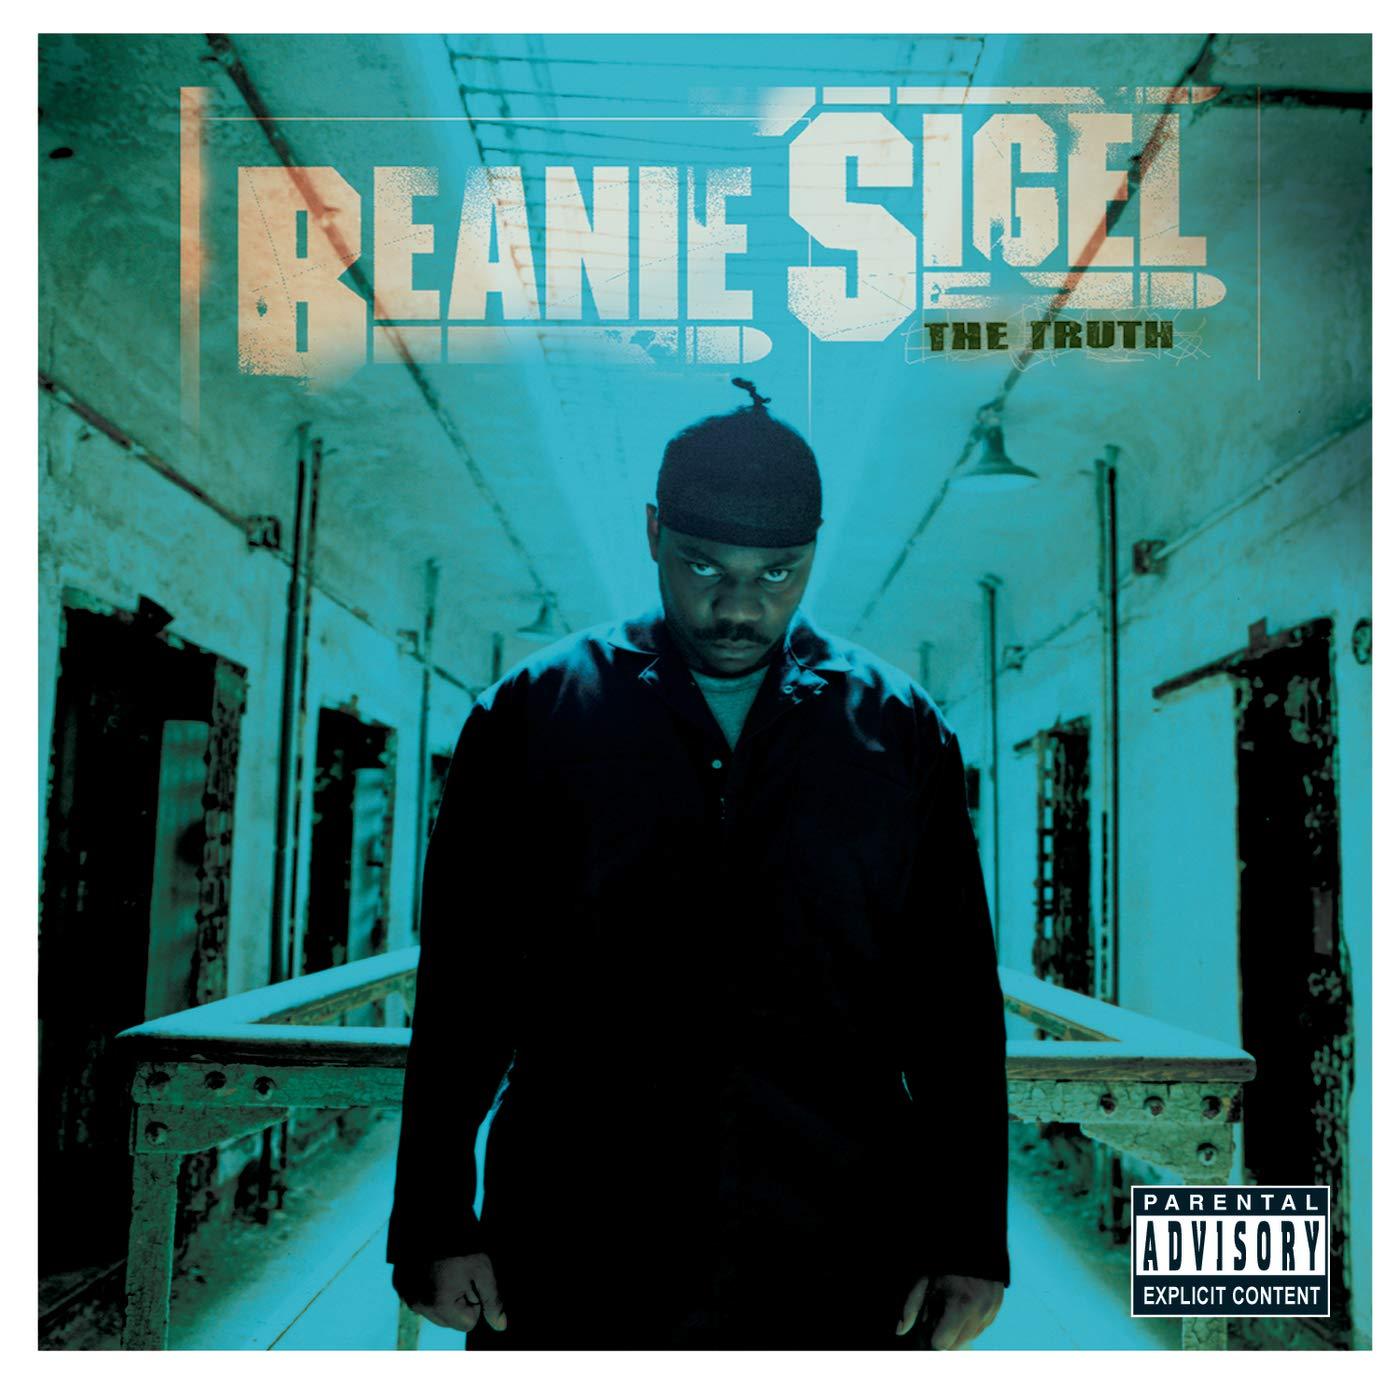 Beanie Sigel – The Truth (2000) [FLAC]